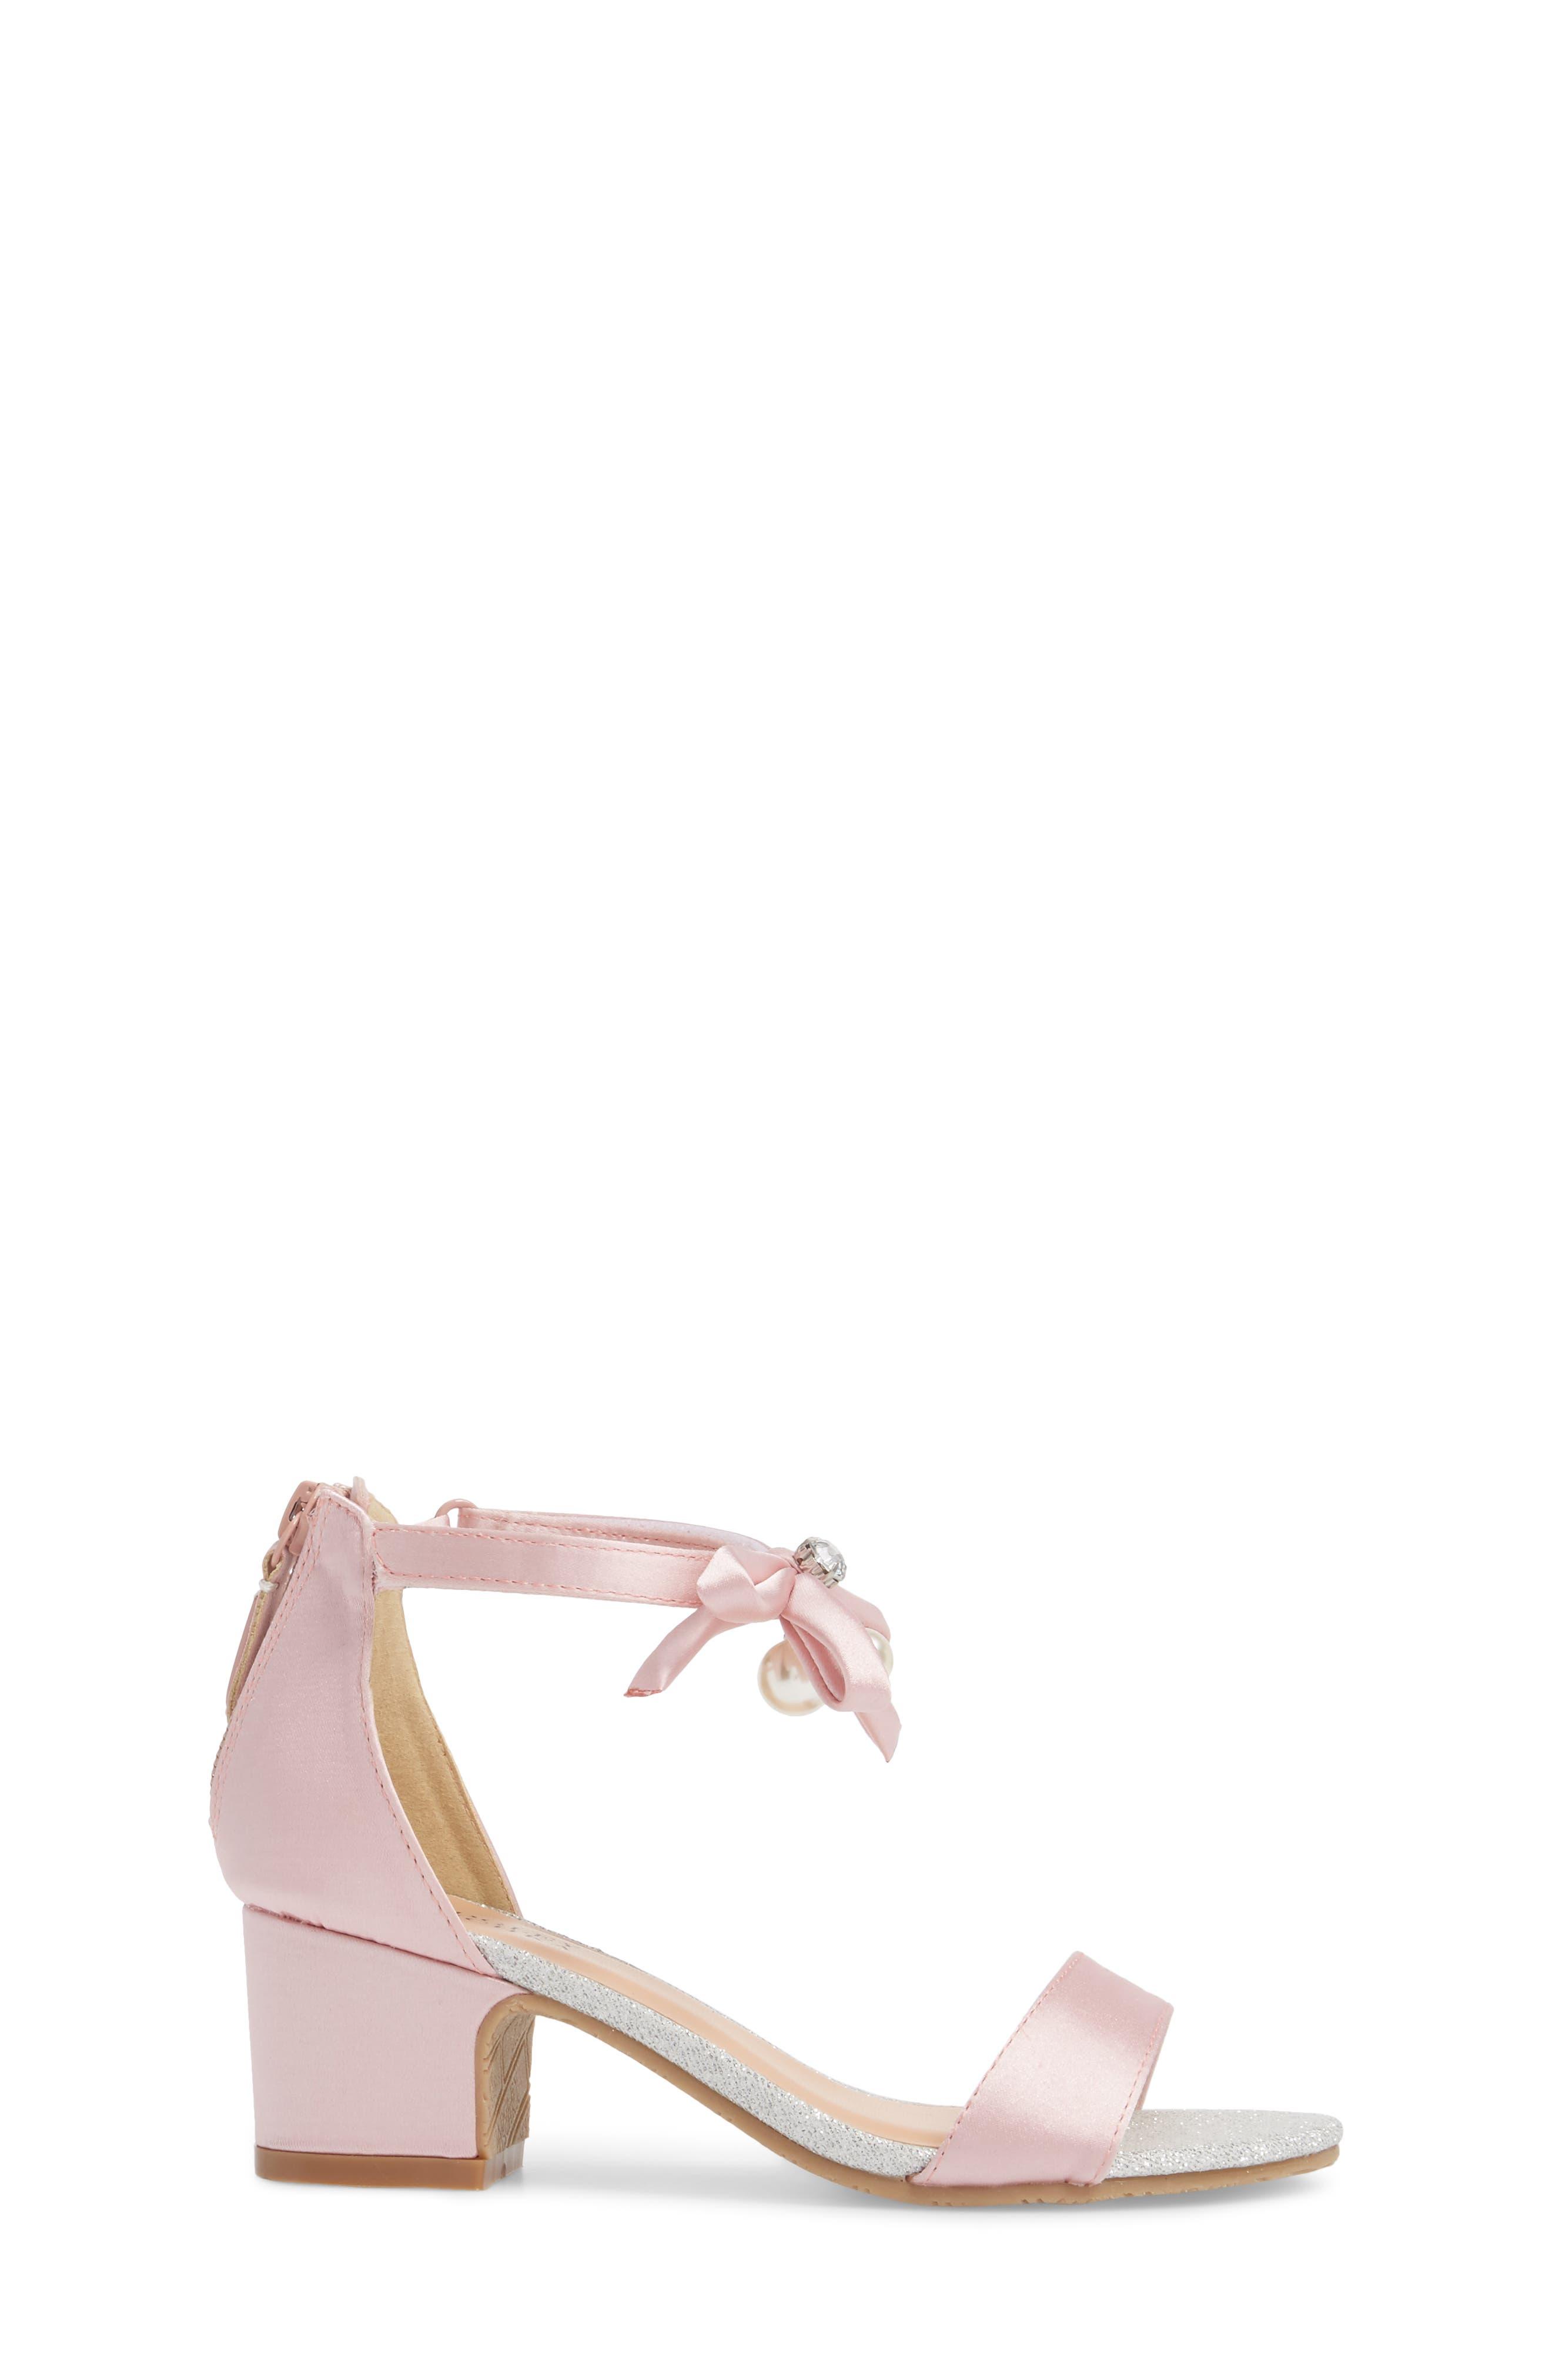 BADGLEY MISCHKA COLLECTION, Badgley Mischka Pernia Embellished Sandal, Alternate thumbnail 3, color, PINK/ SILVER